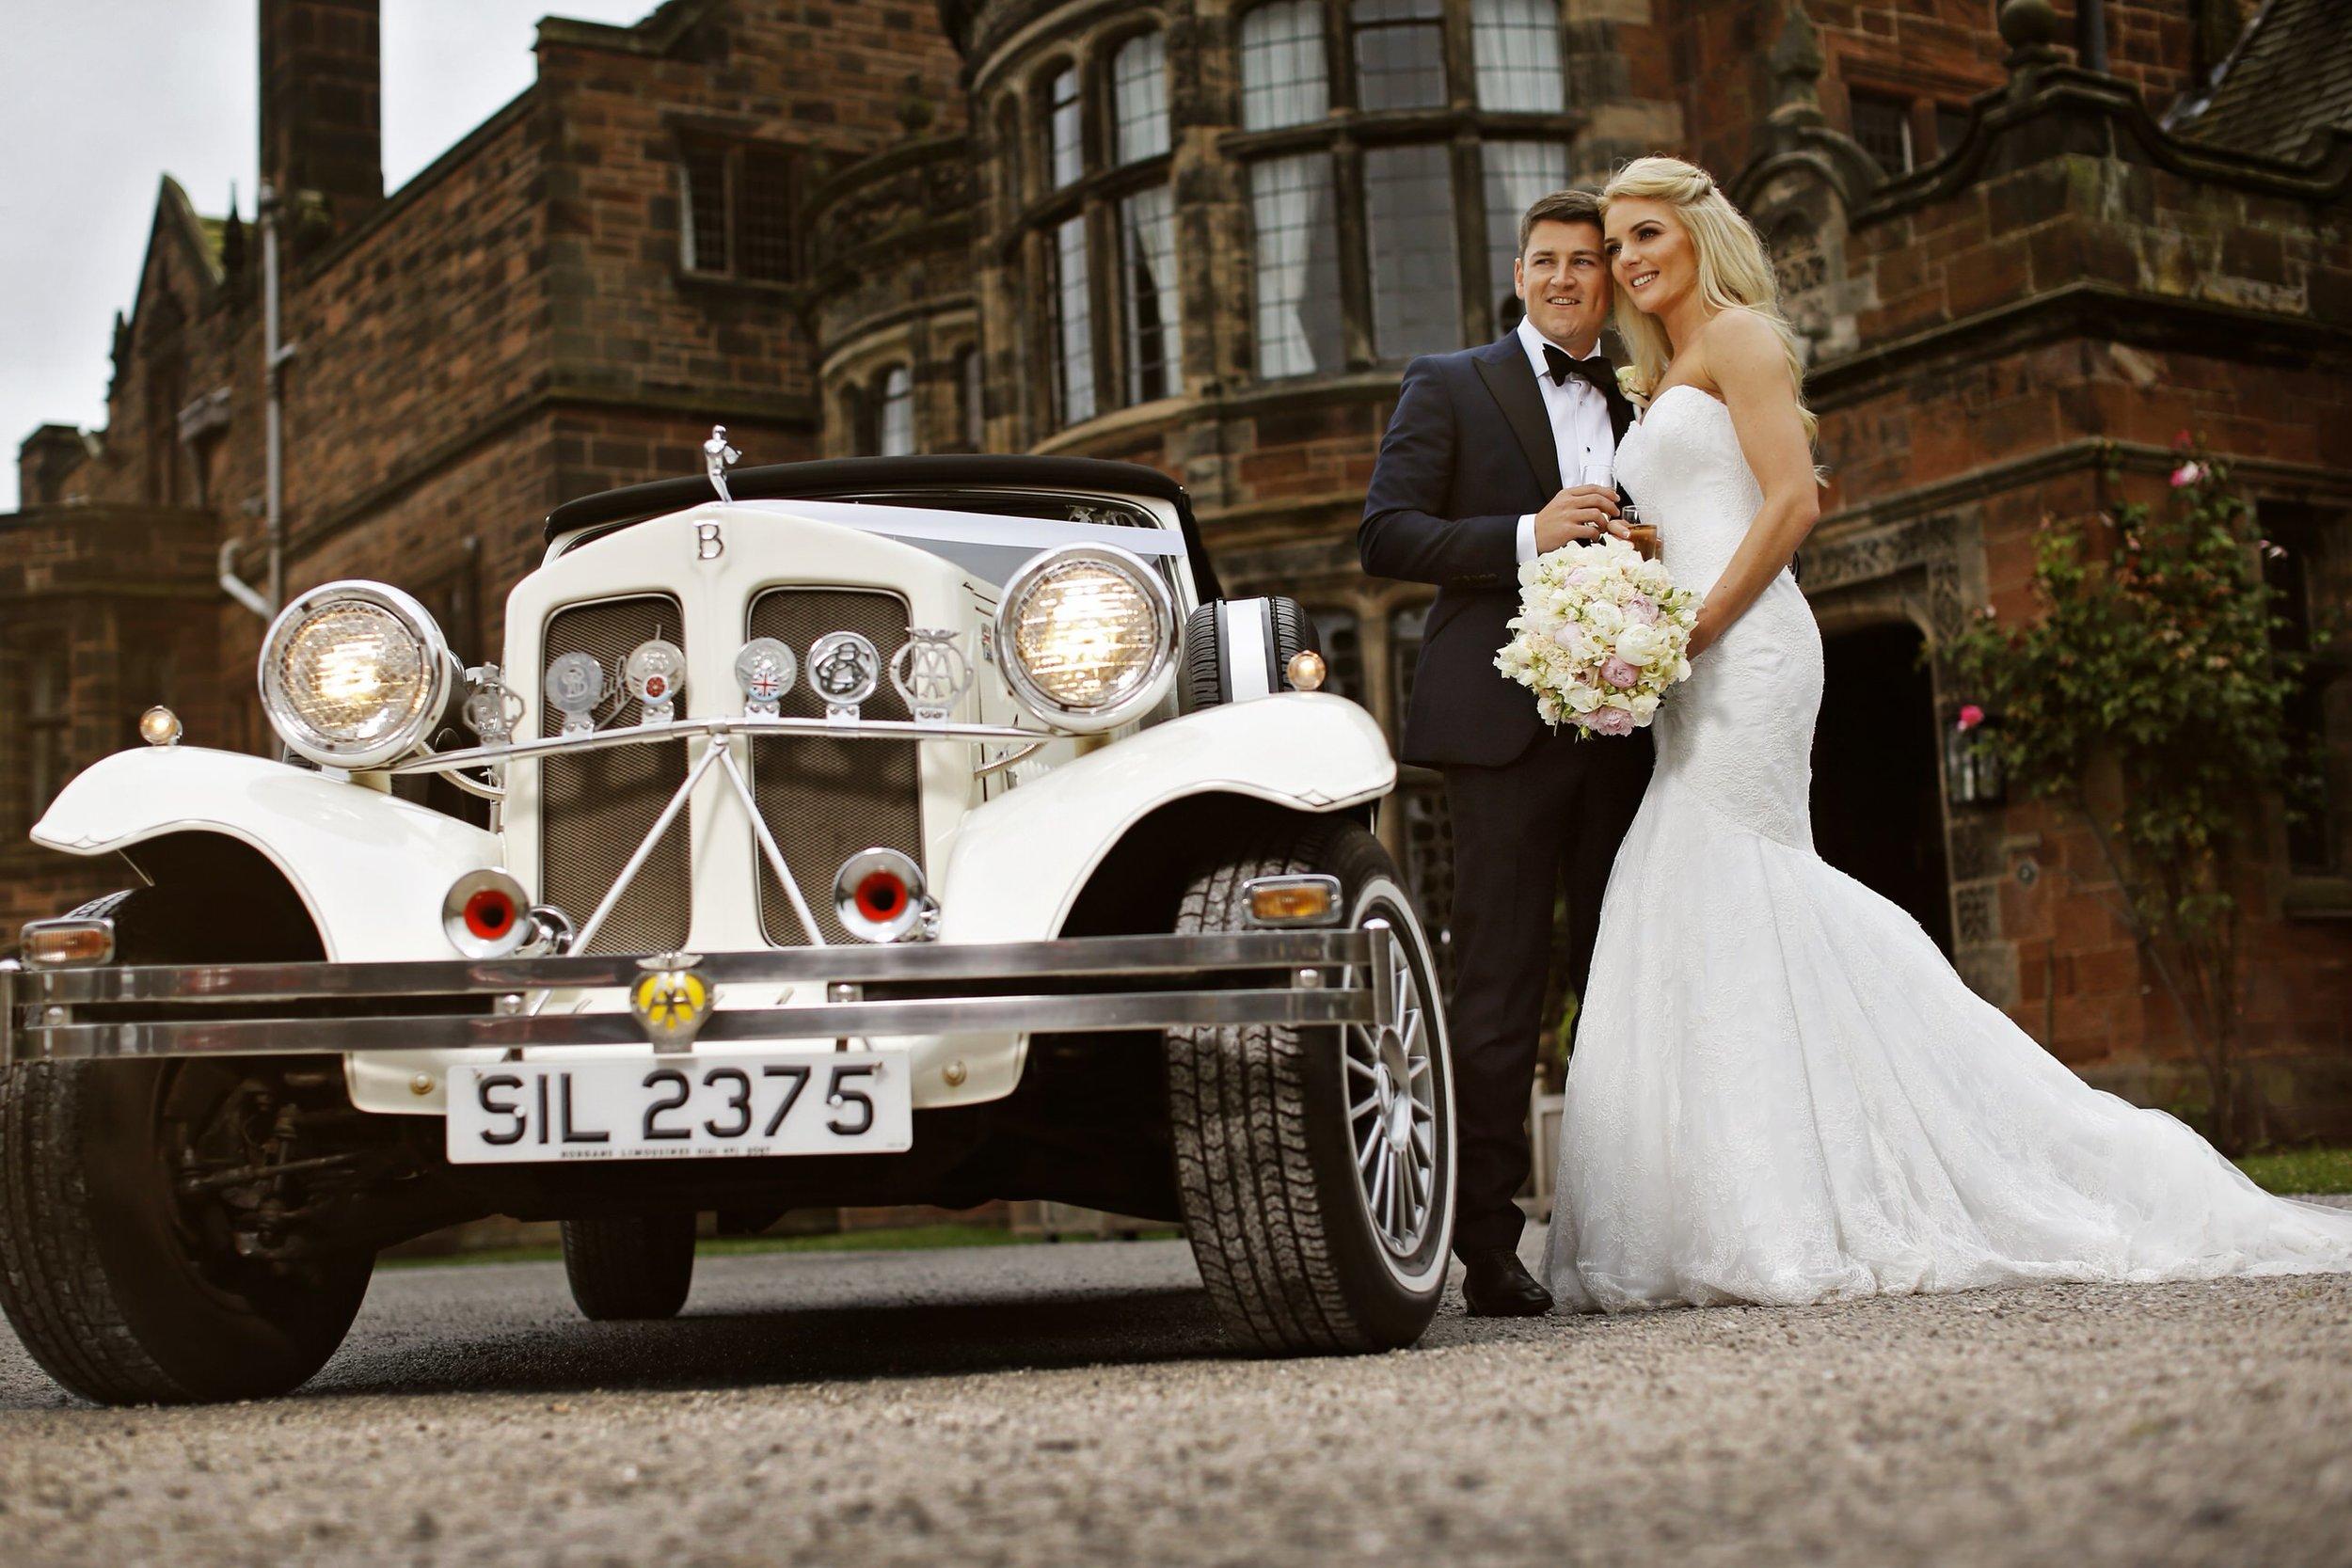 cheshire-wedding-photographer-thornton-manor-weddings_0013.jpg